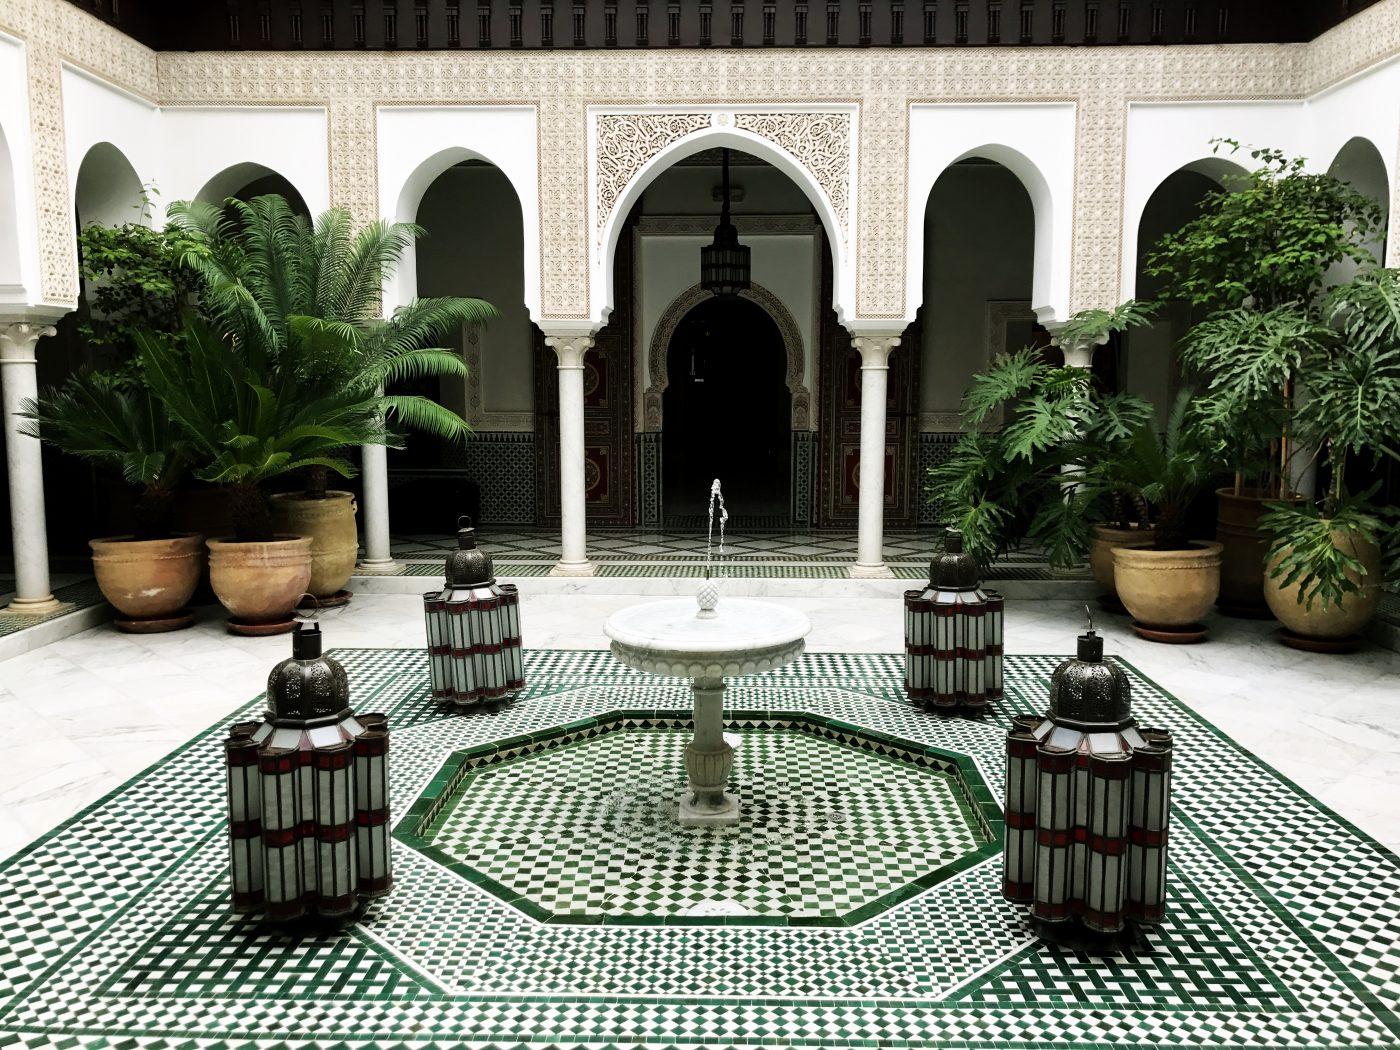 Marrakech travel destination